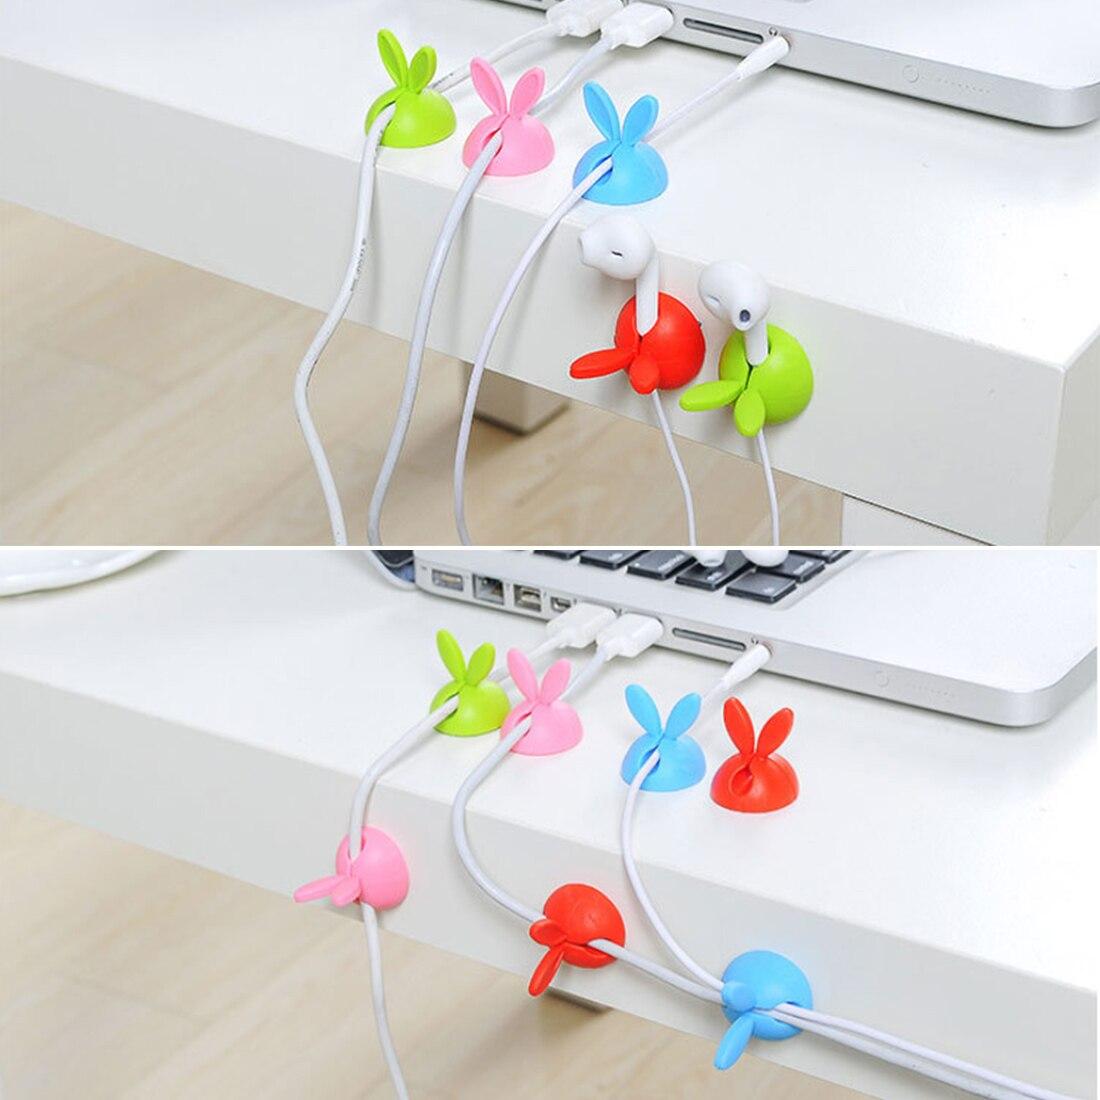 Plastic Headphone Winder Cable Organizer Computer Bobbin Wire Holder Desktop US